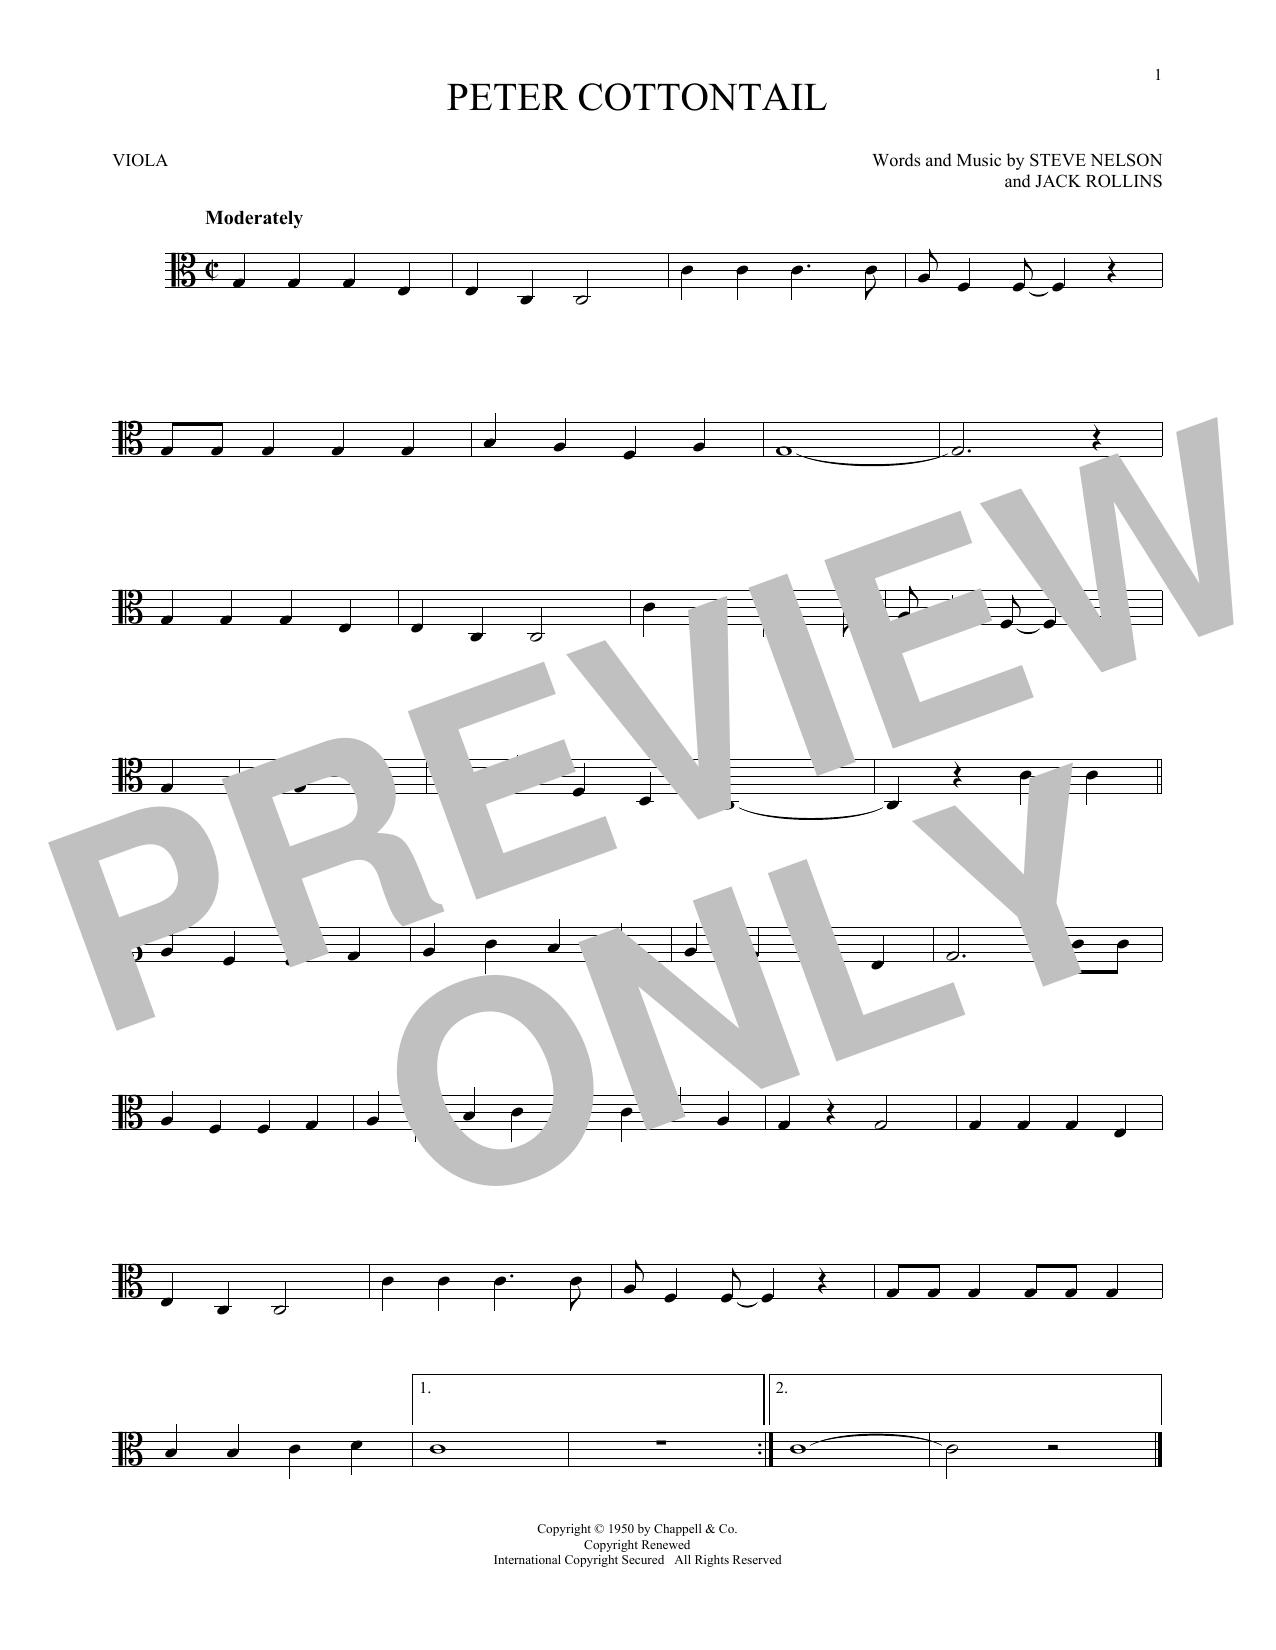 Peter Cottontail (Viola Solo)